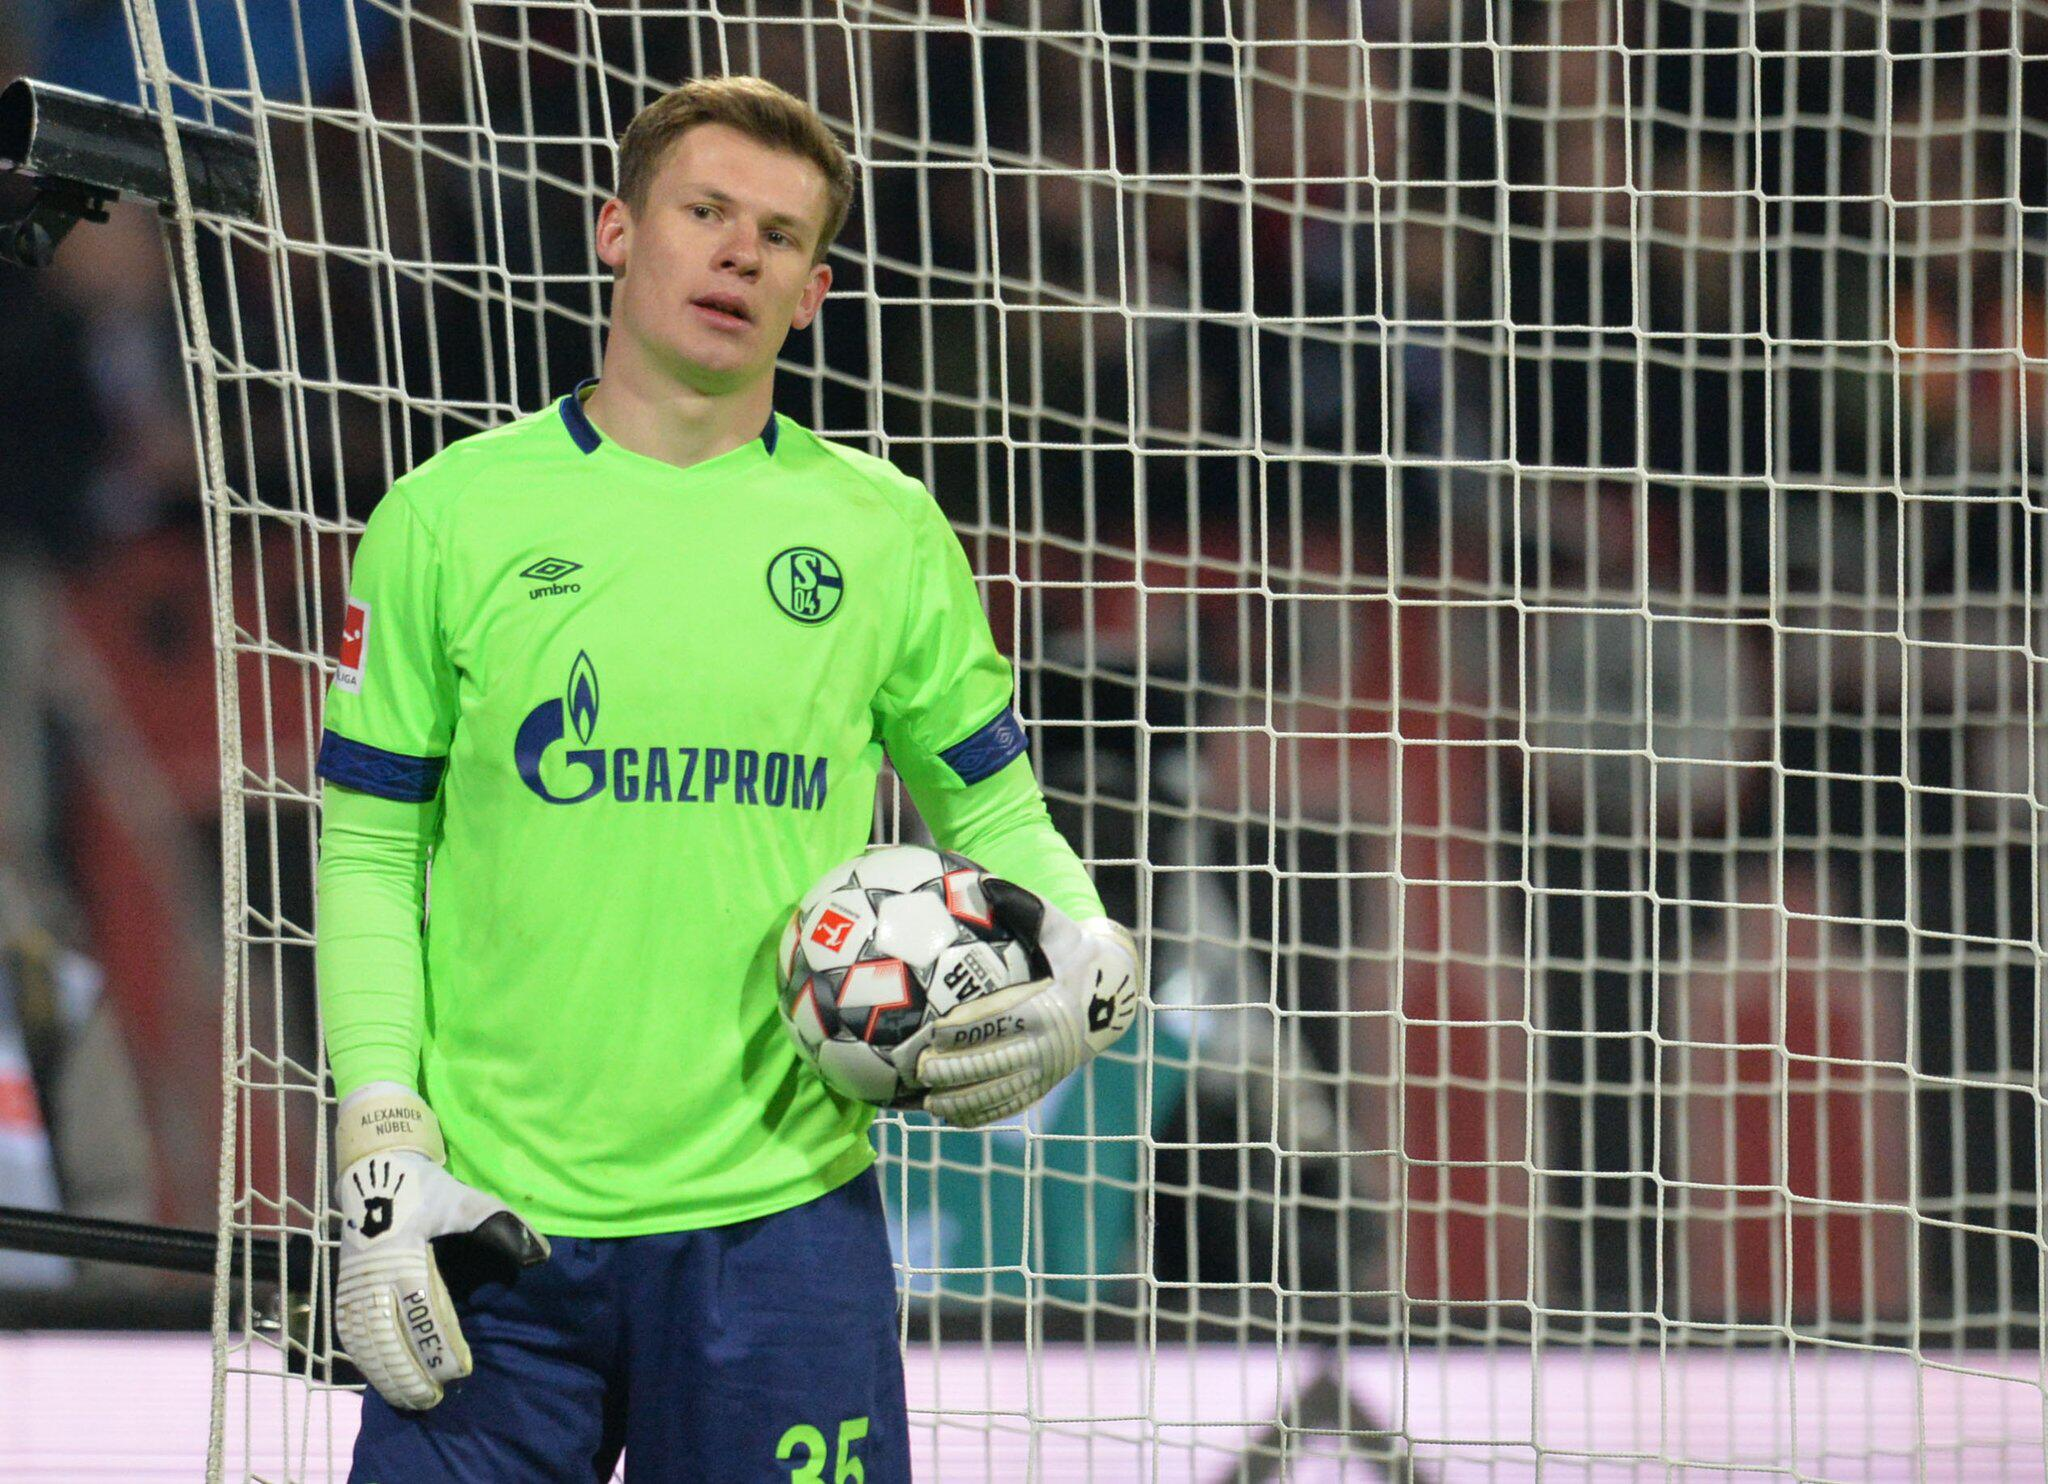 Bild zu 1. FC Nürnberg - FC Schalke 04